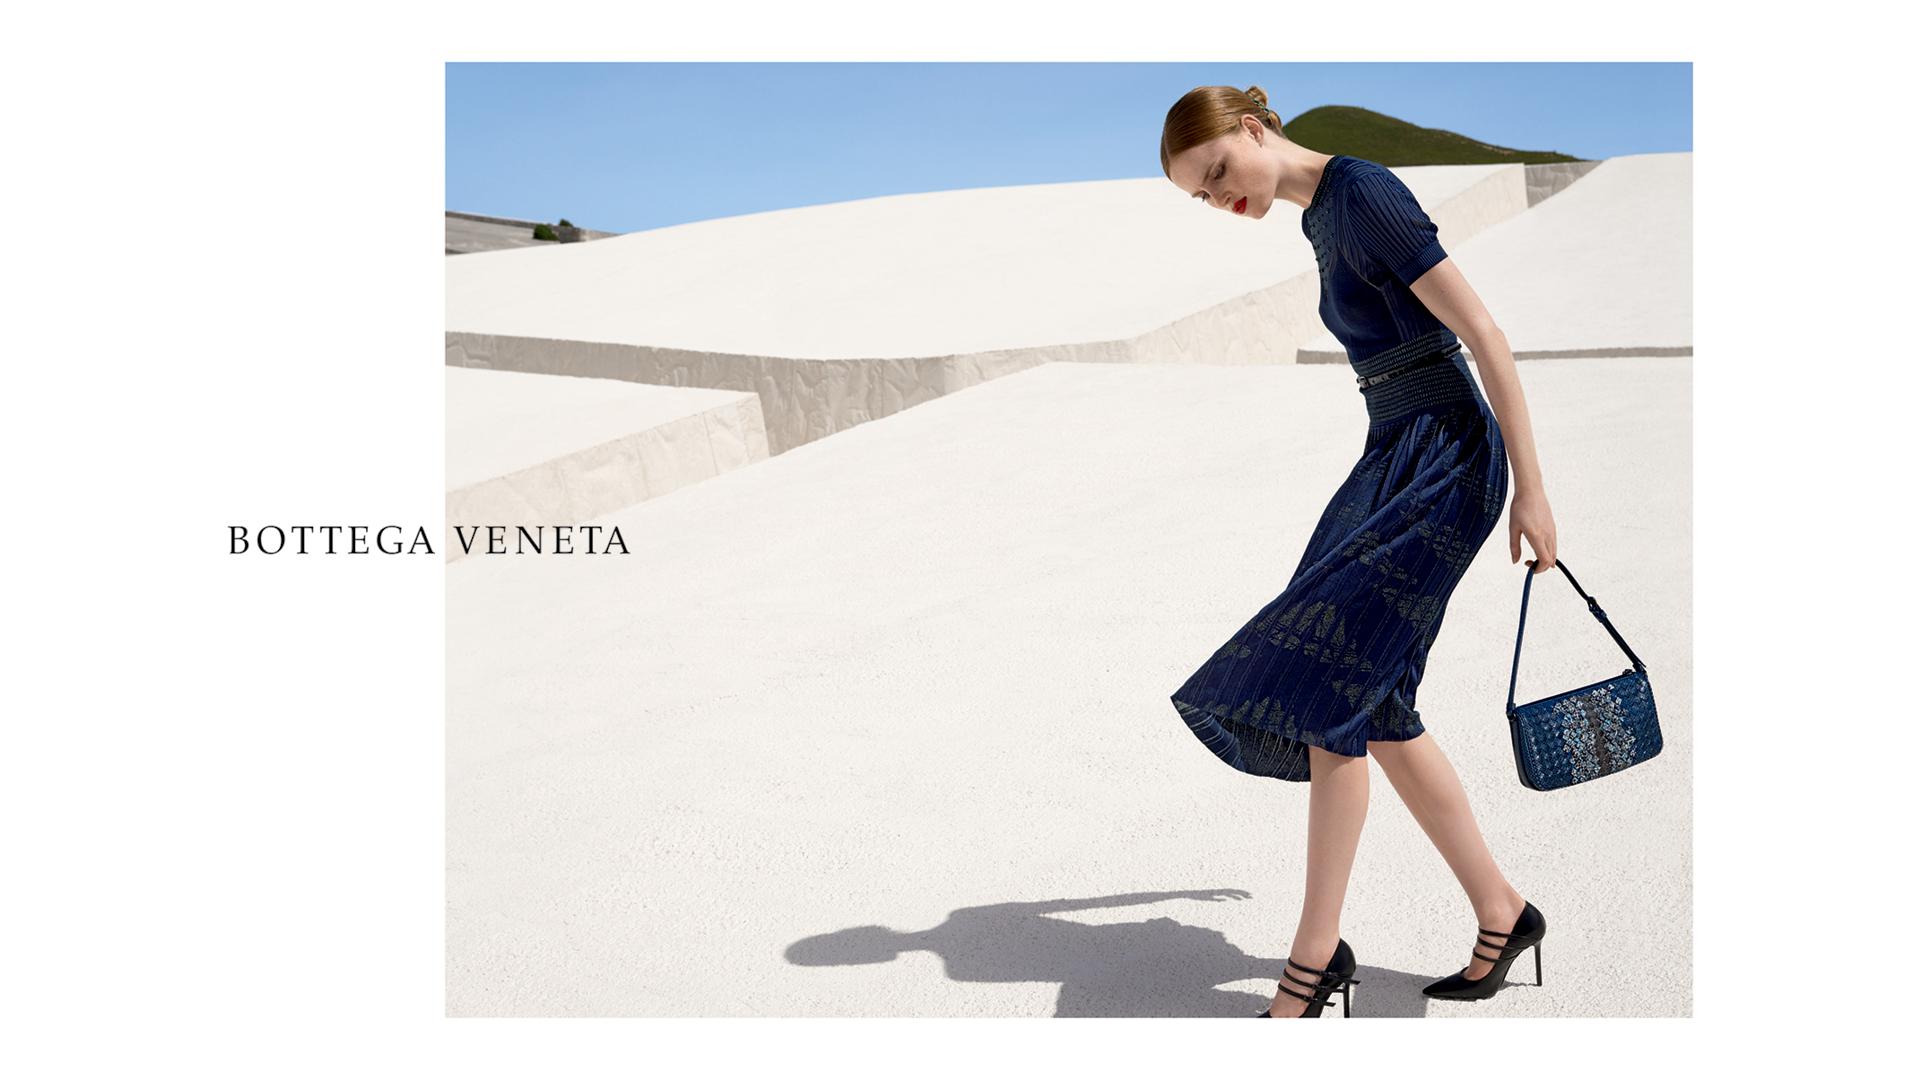 Bottega Veneta Collaborates with Viviane Sassen and Alberto Burri